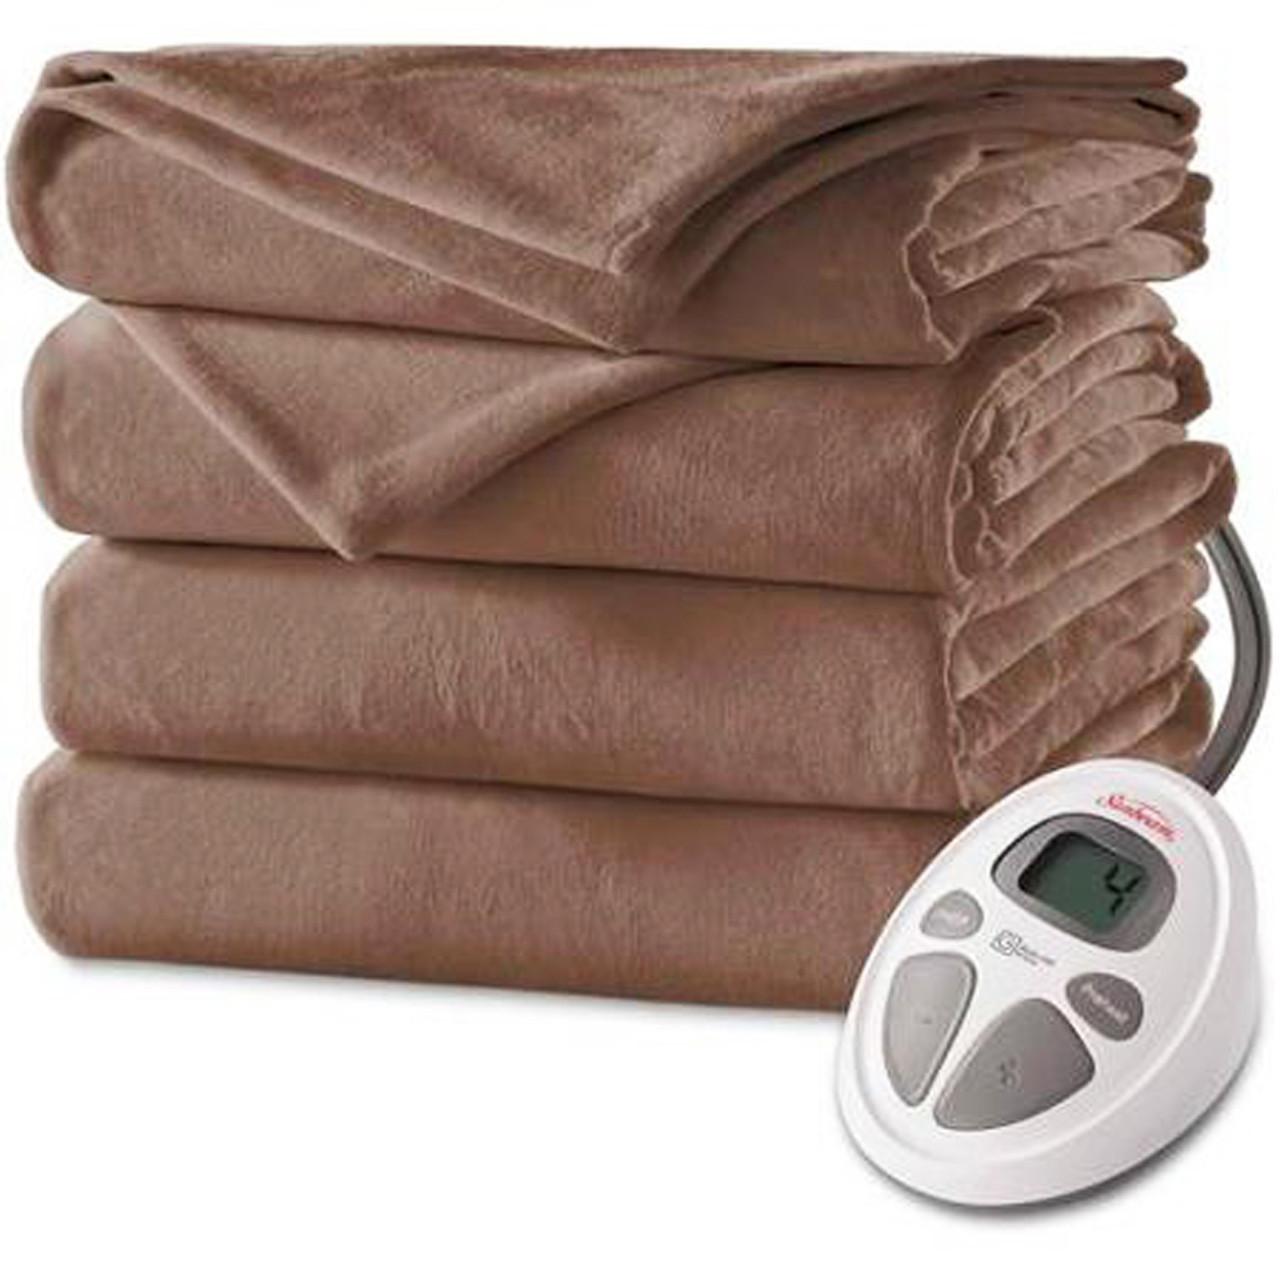 Moms Gear  Sunbeam Velvet Plush Heating Blanket should definitely keep you  warm at night - Sun Sentinel f1427f6d9